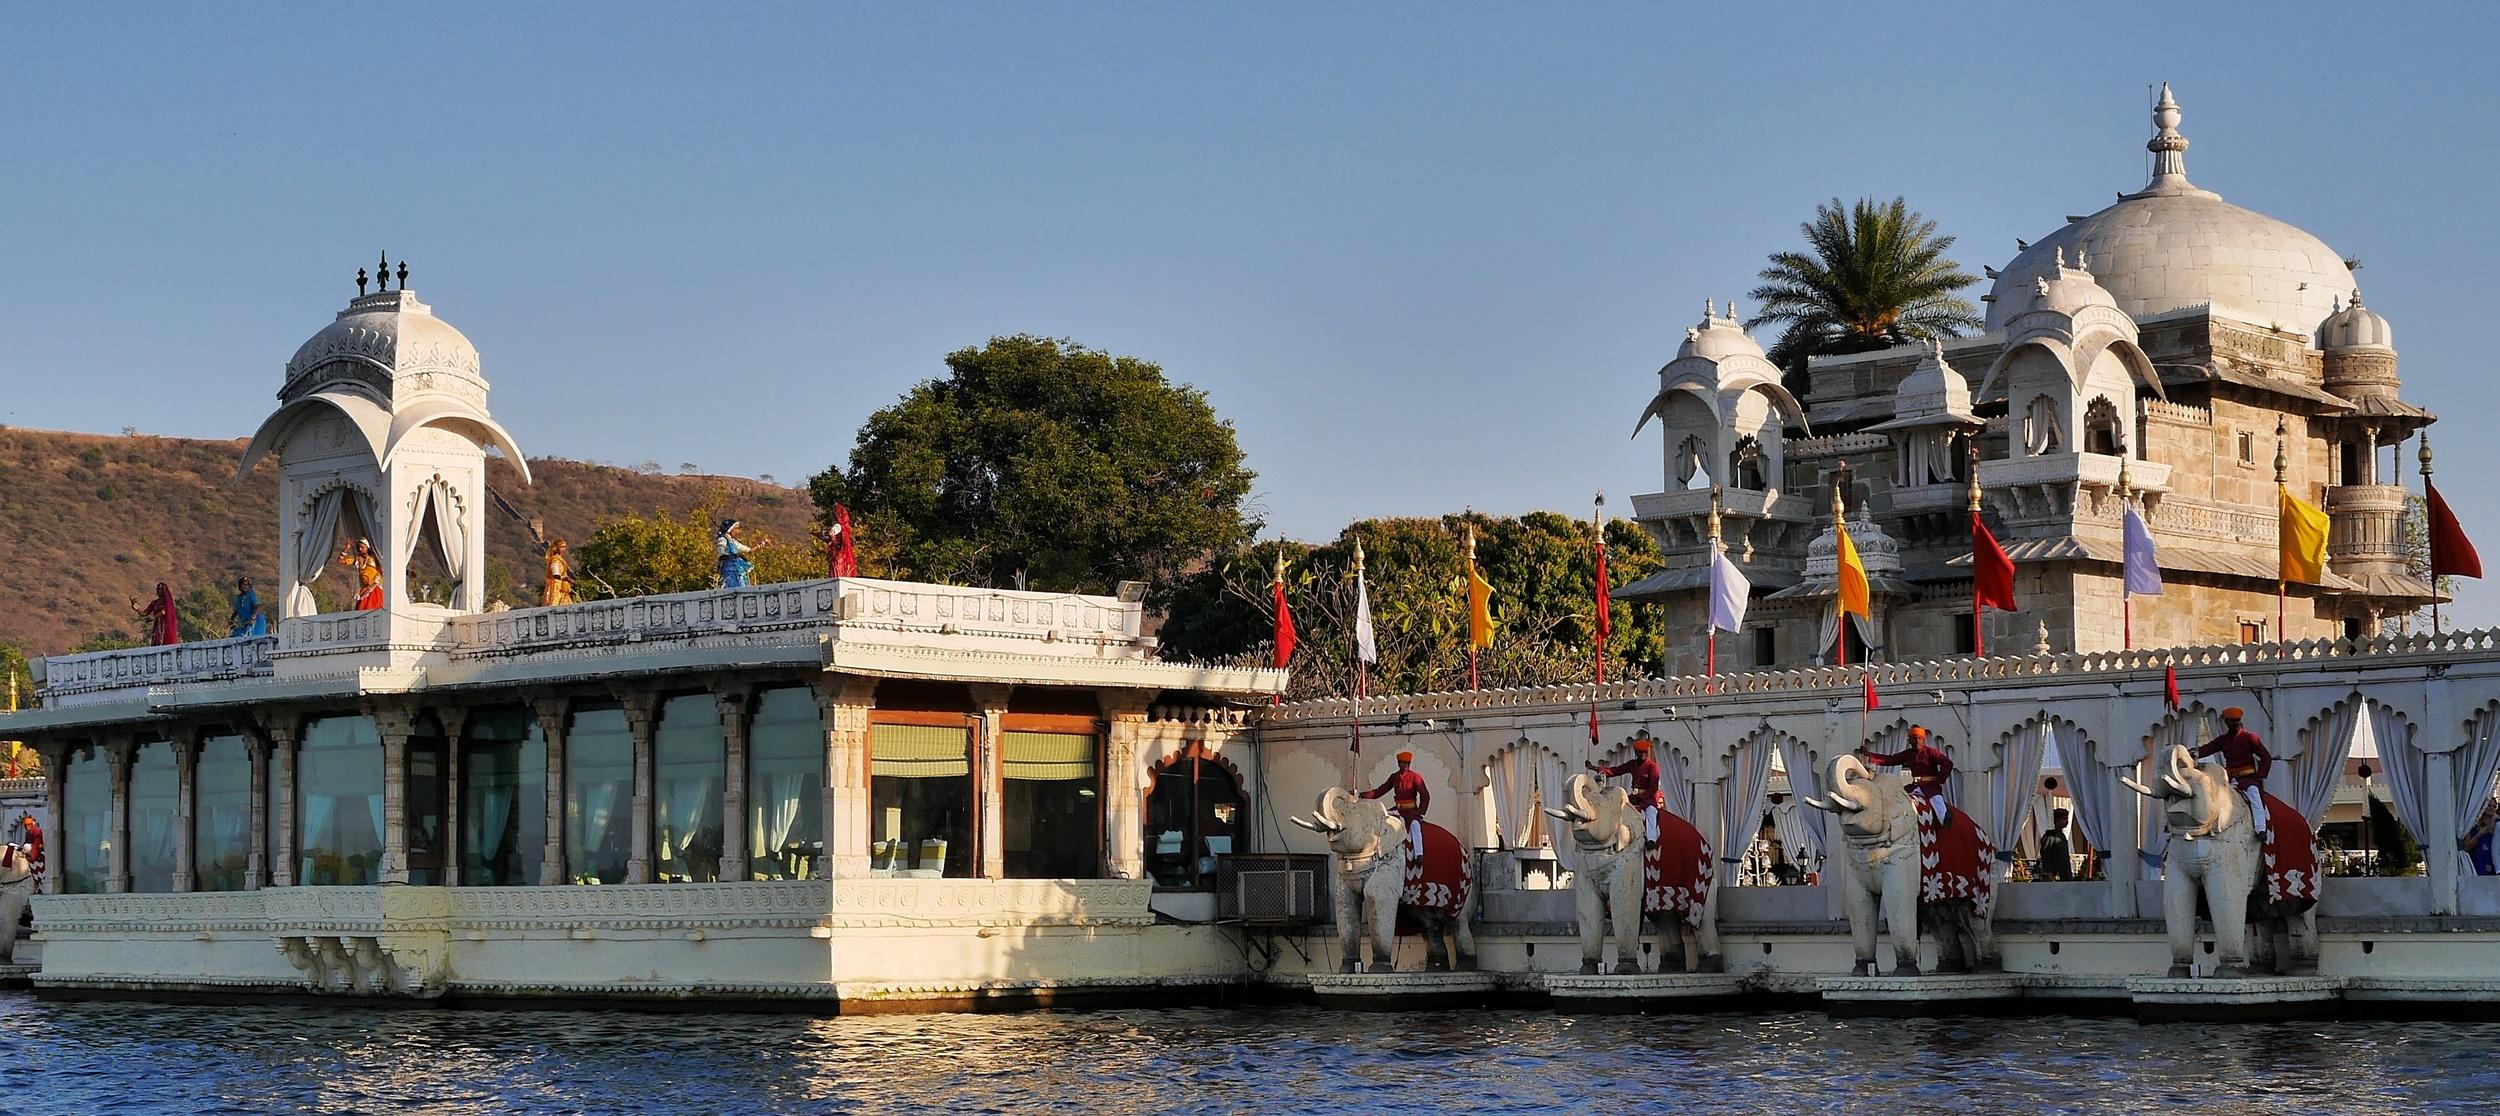 Day 3 Jagmandir Island Palace: The Wedding